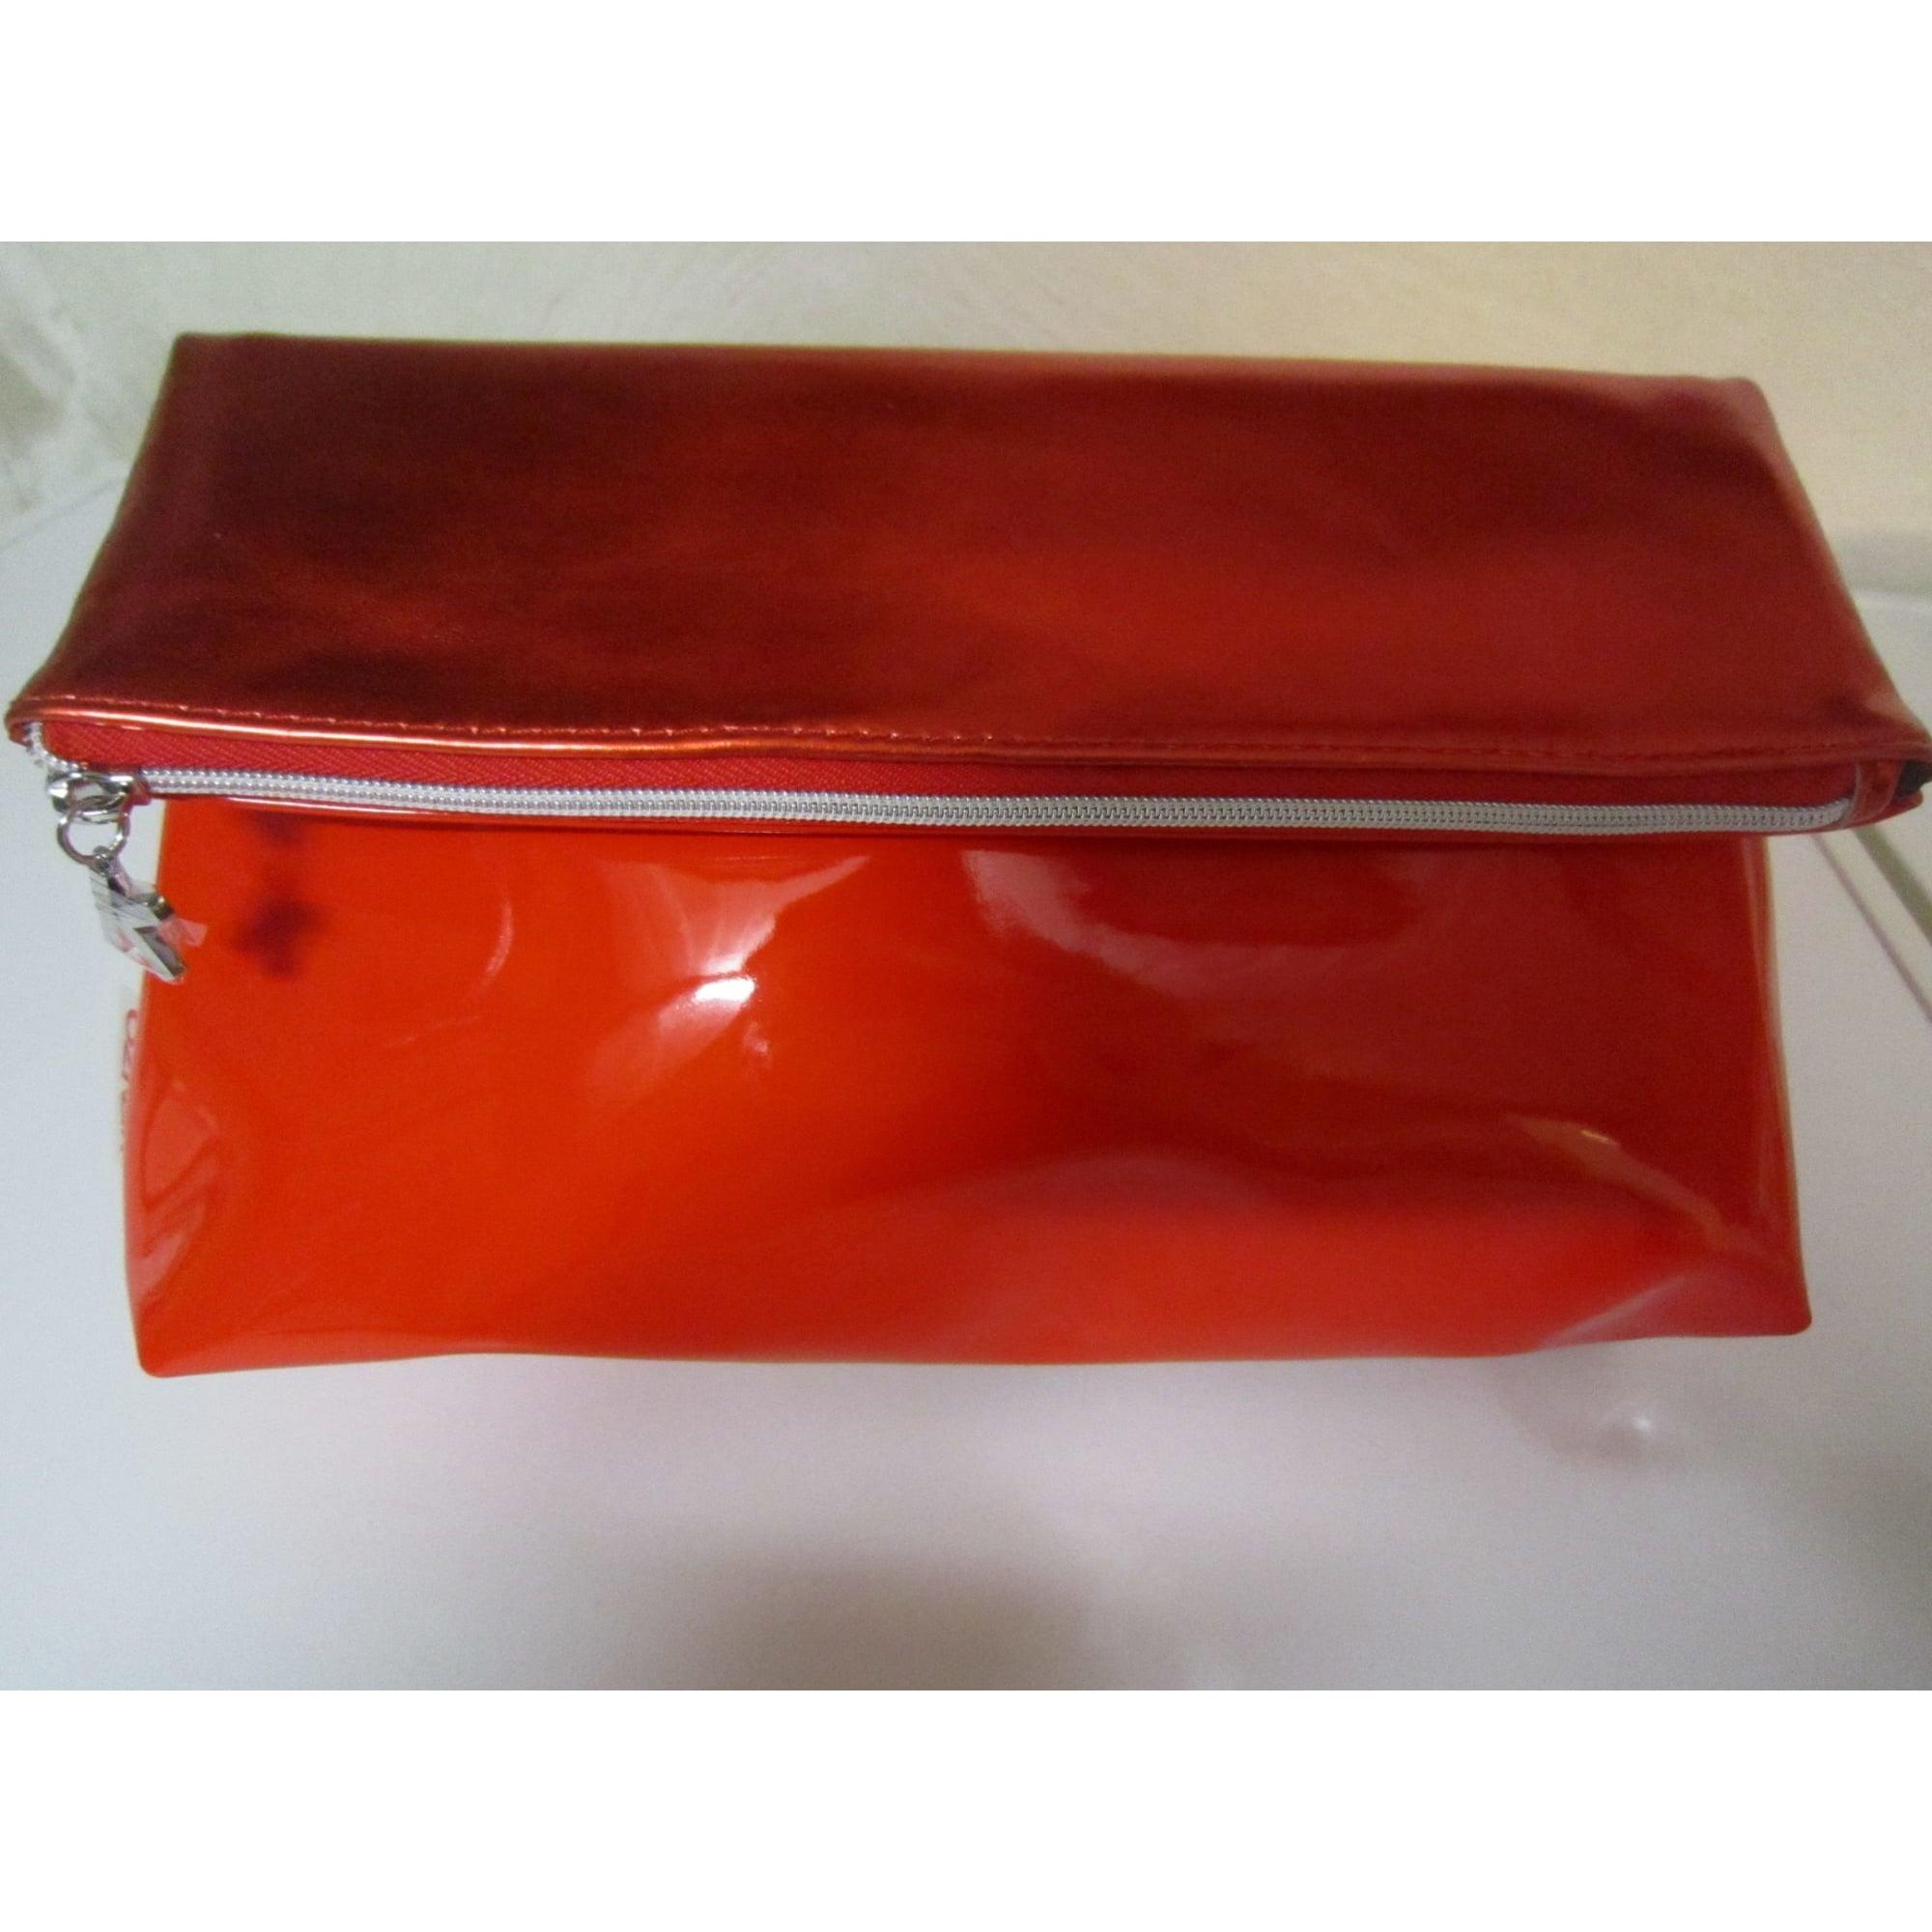 Parfum Rouge Rouge Rouge Pochette Parfum Parfum Kenzo Pochette Kenzo Pochette Kenzo Pochette 8mwvN0n